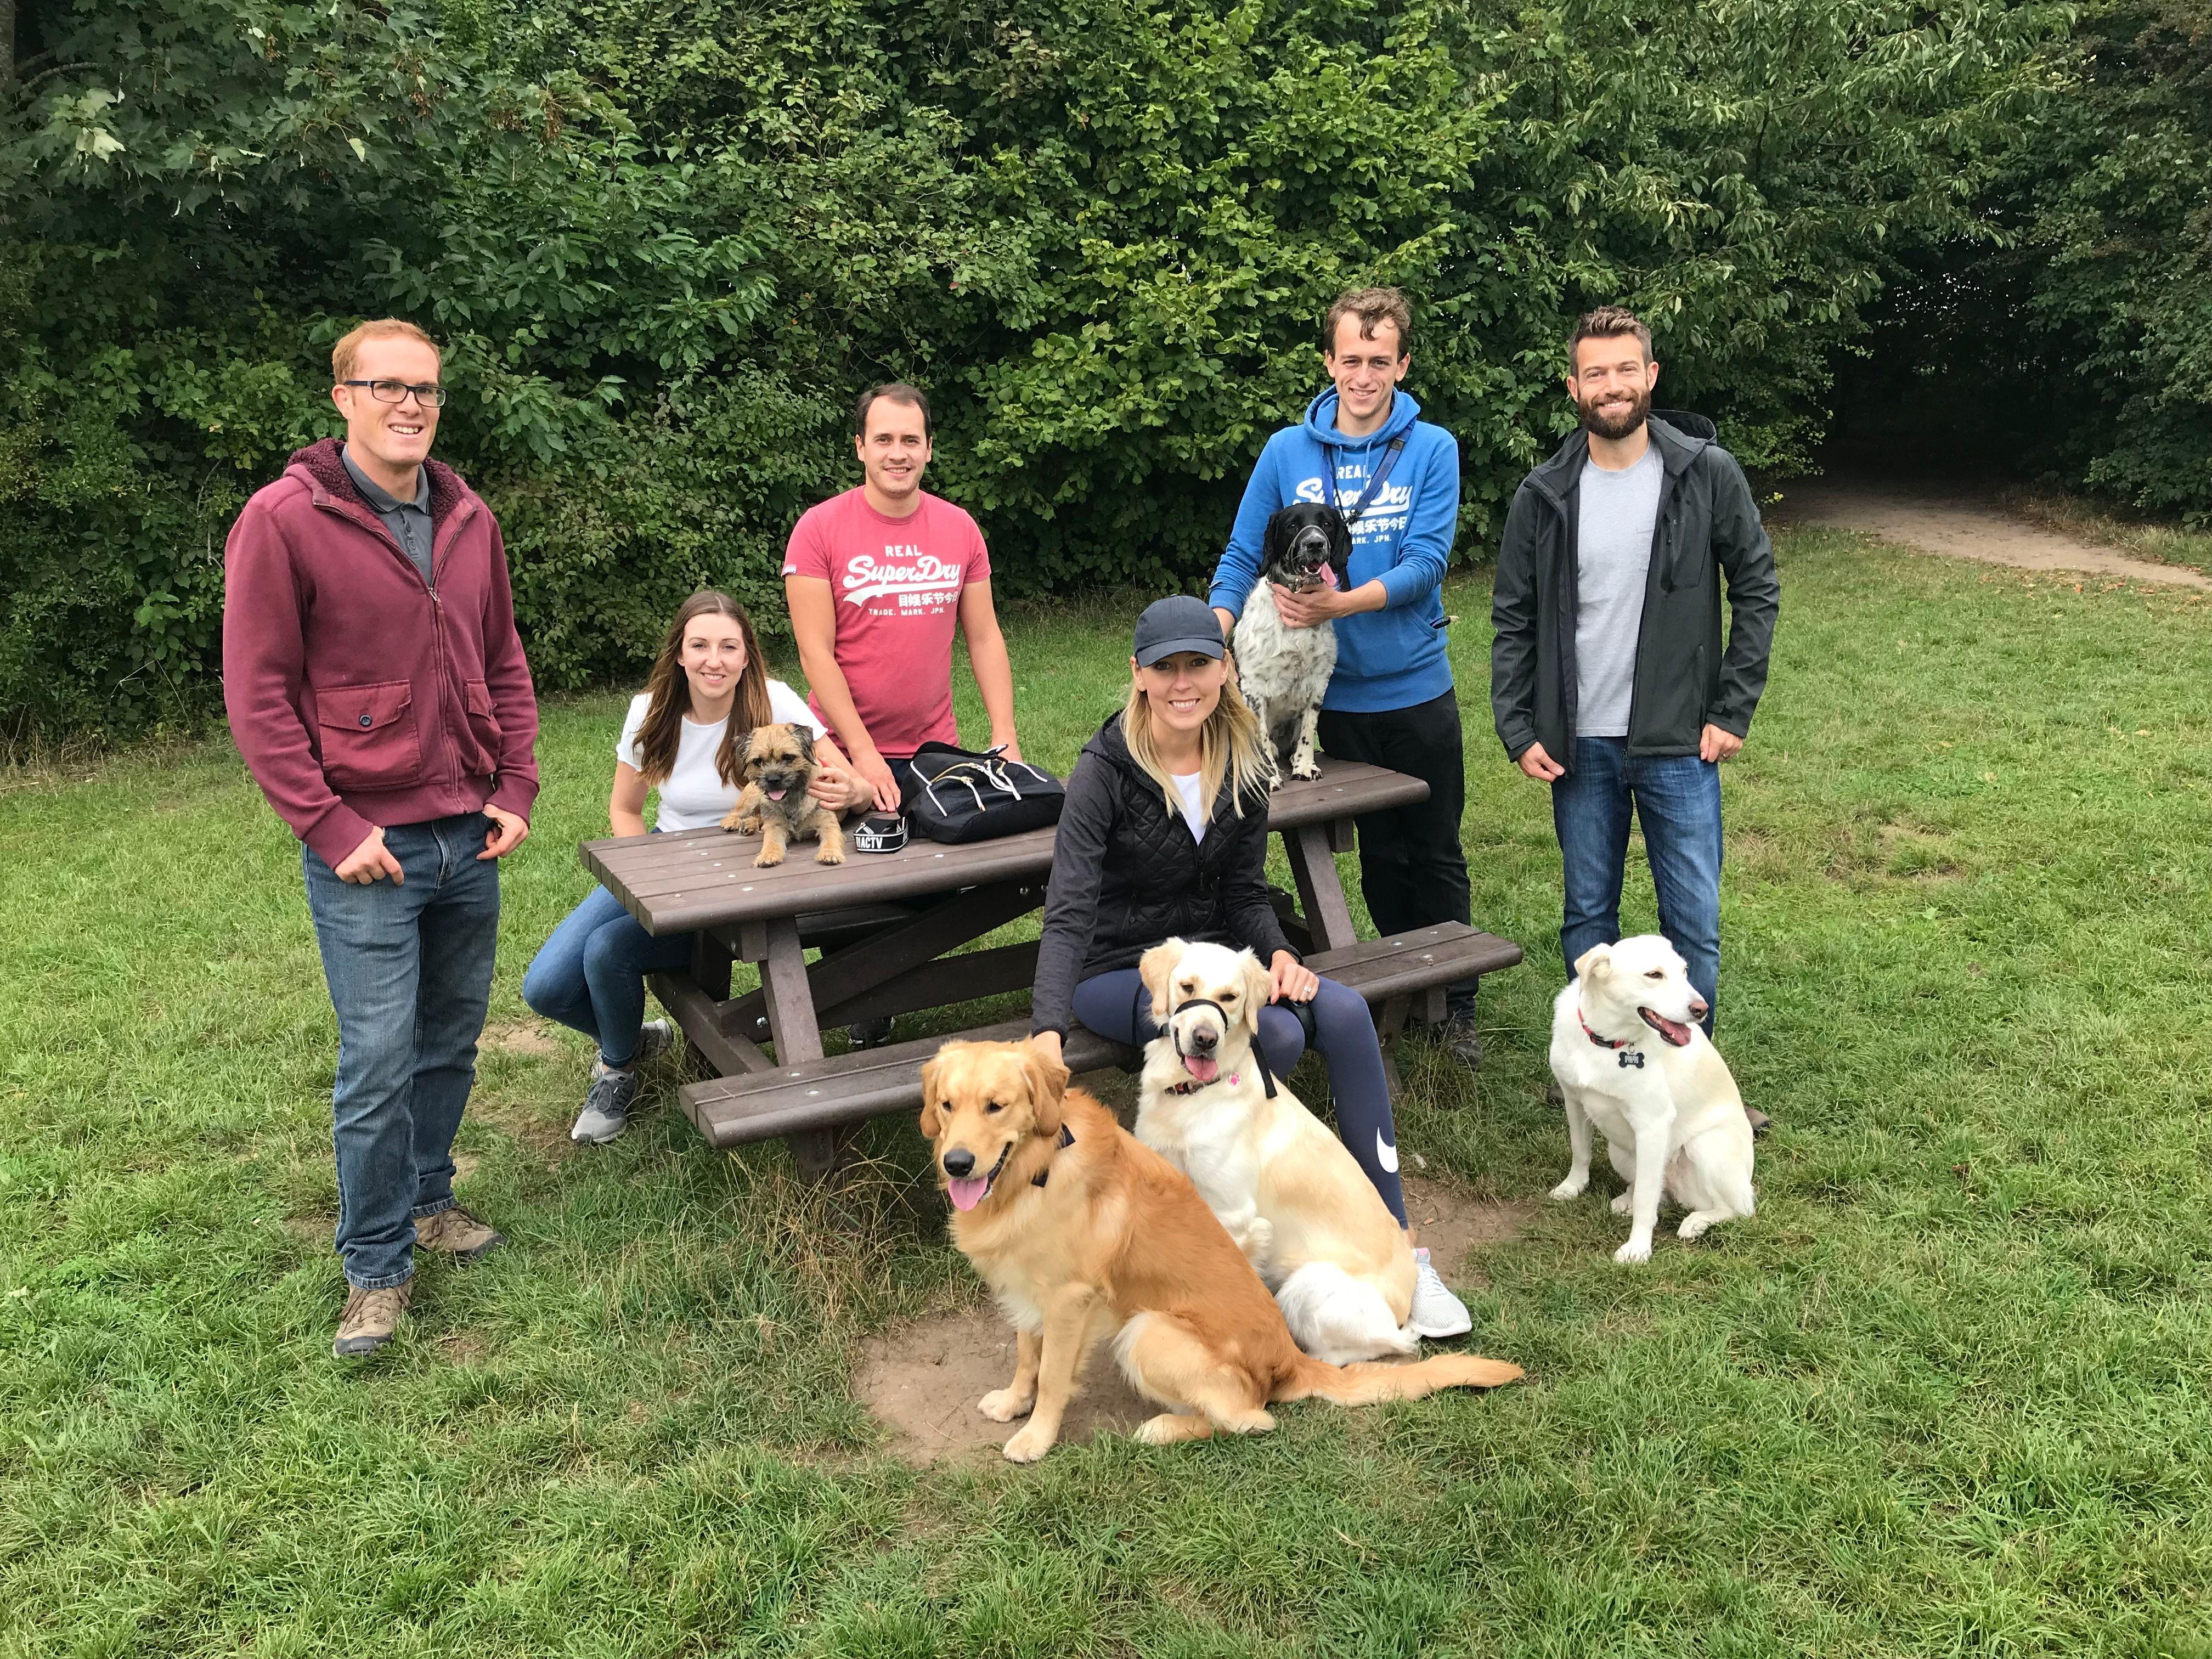 Dog Walking Social Group